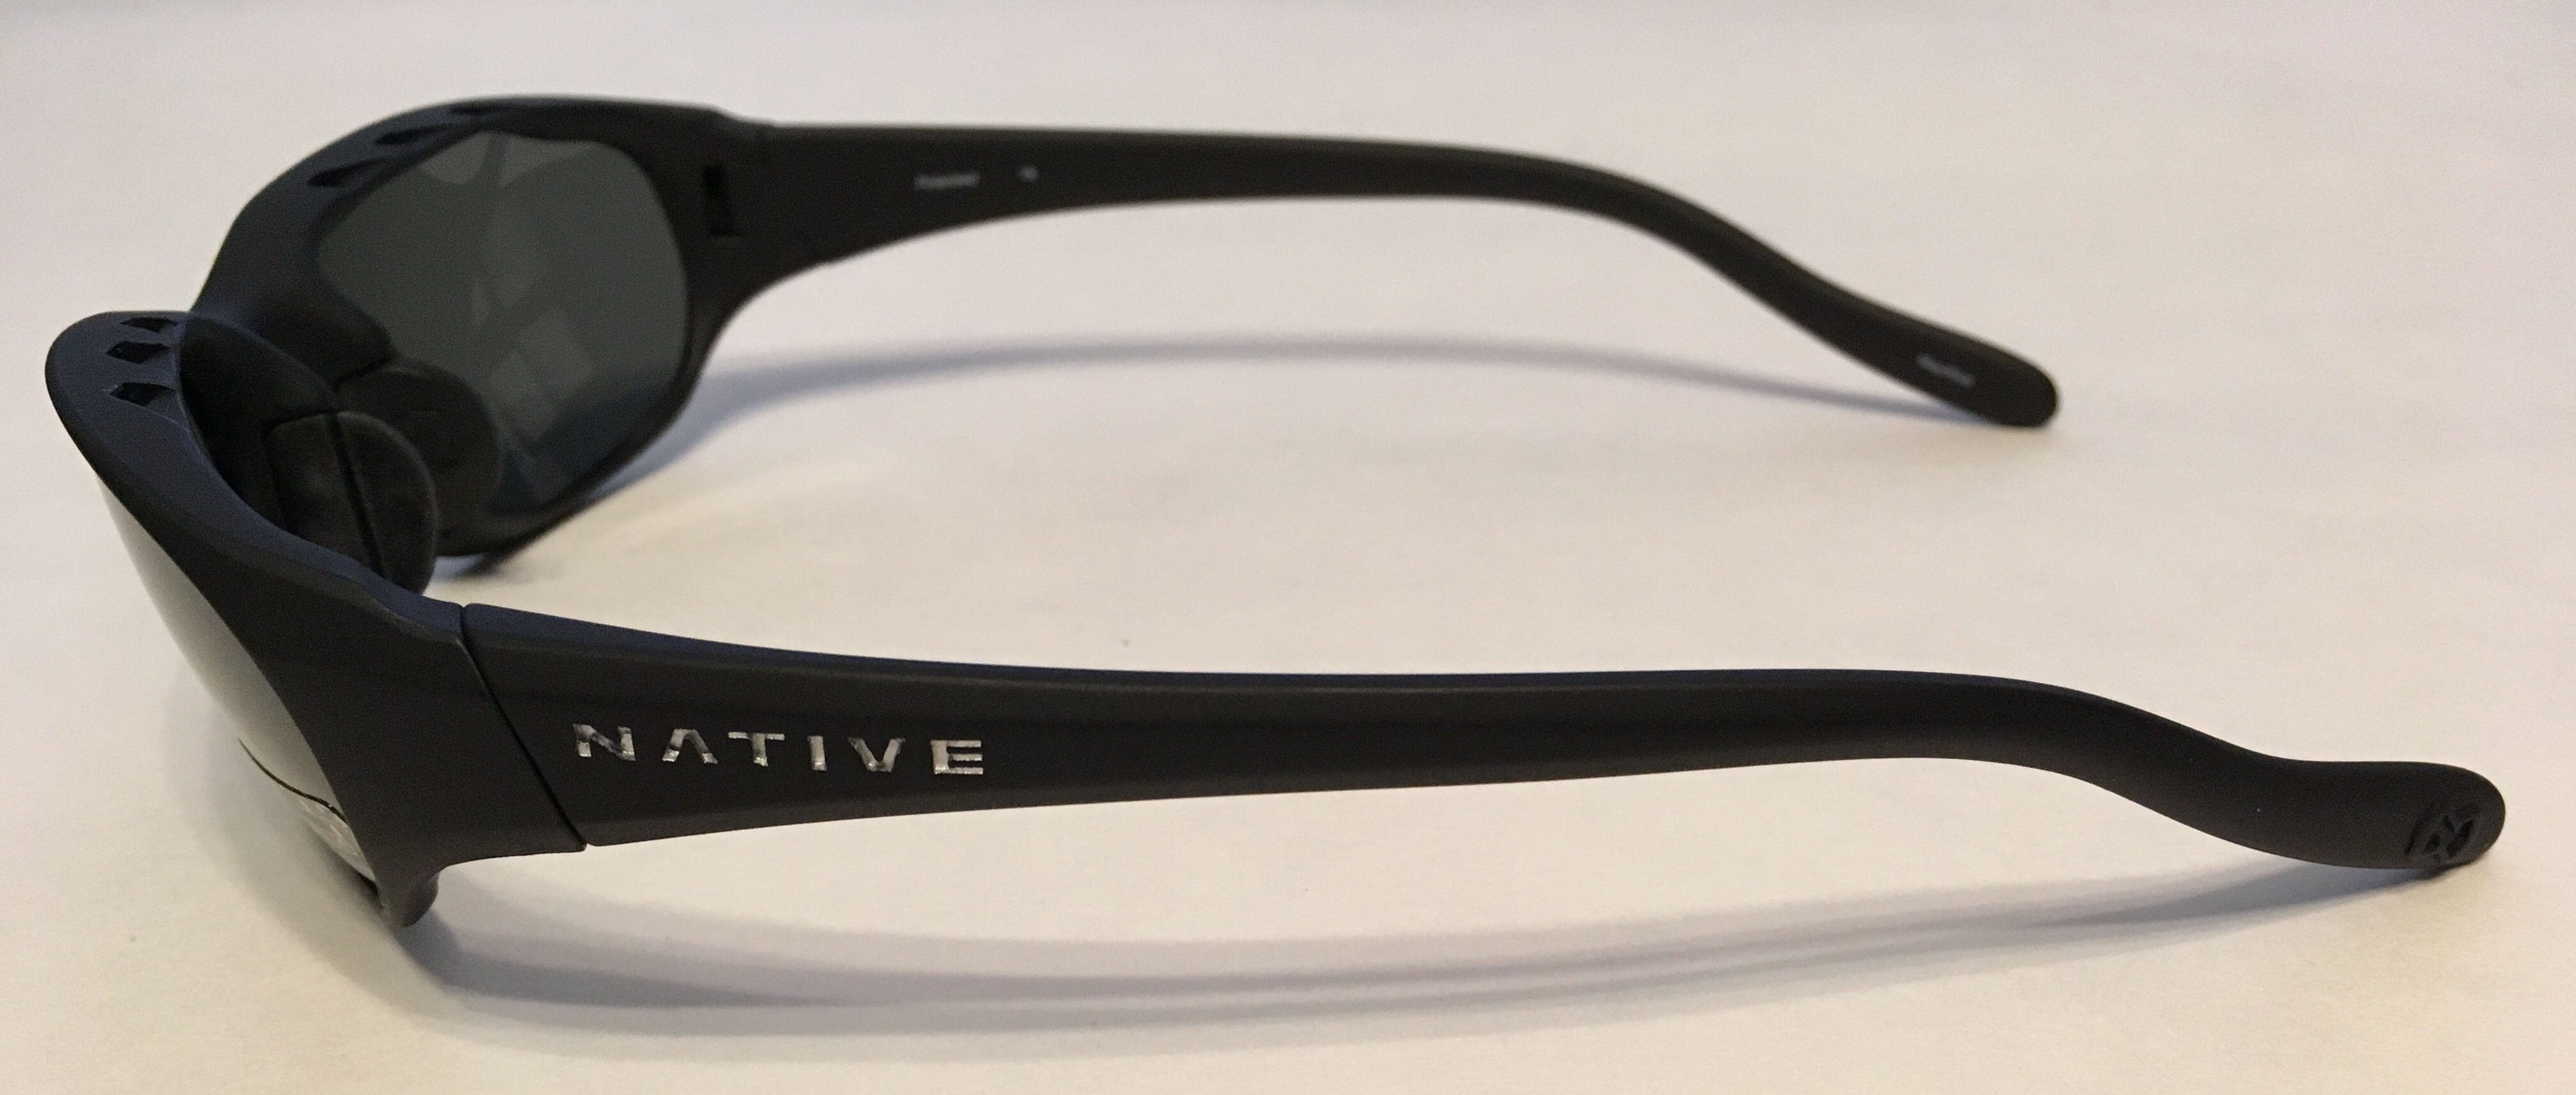 Native Eyewear Throttle Sunglasses - Asphalt Matte Black - POLARIZED Gray